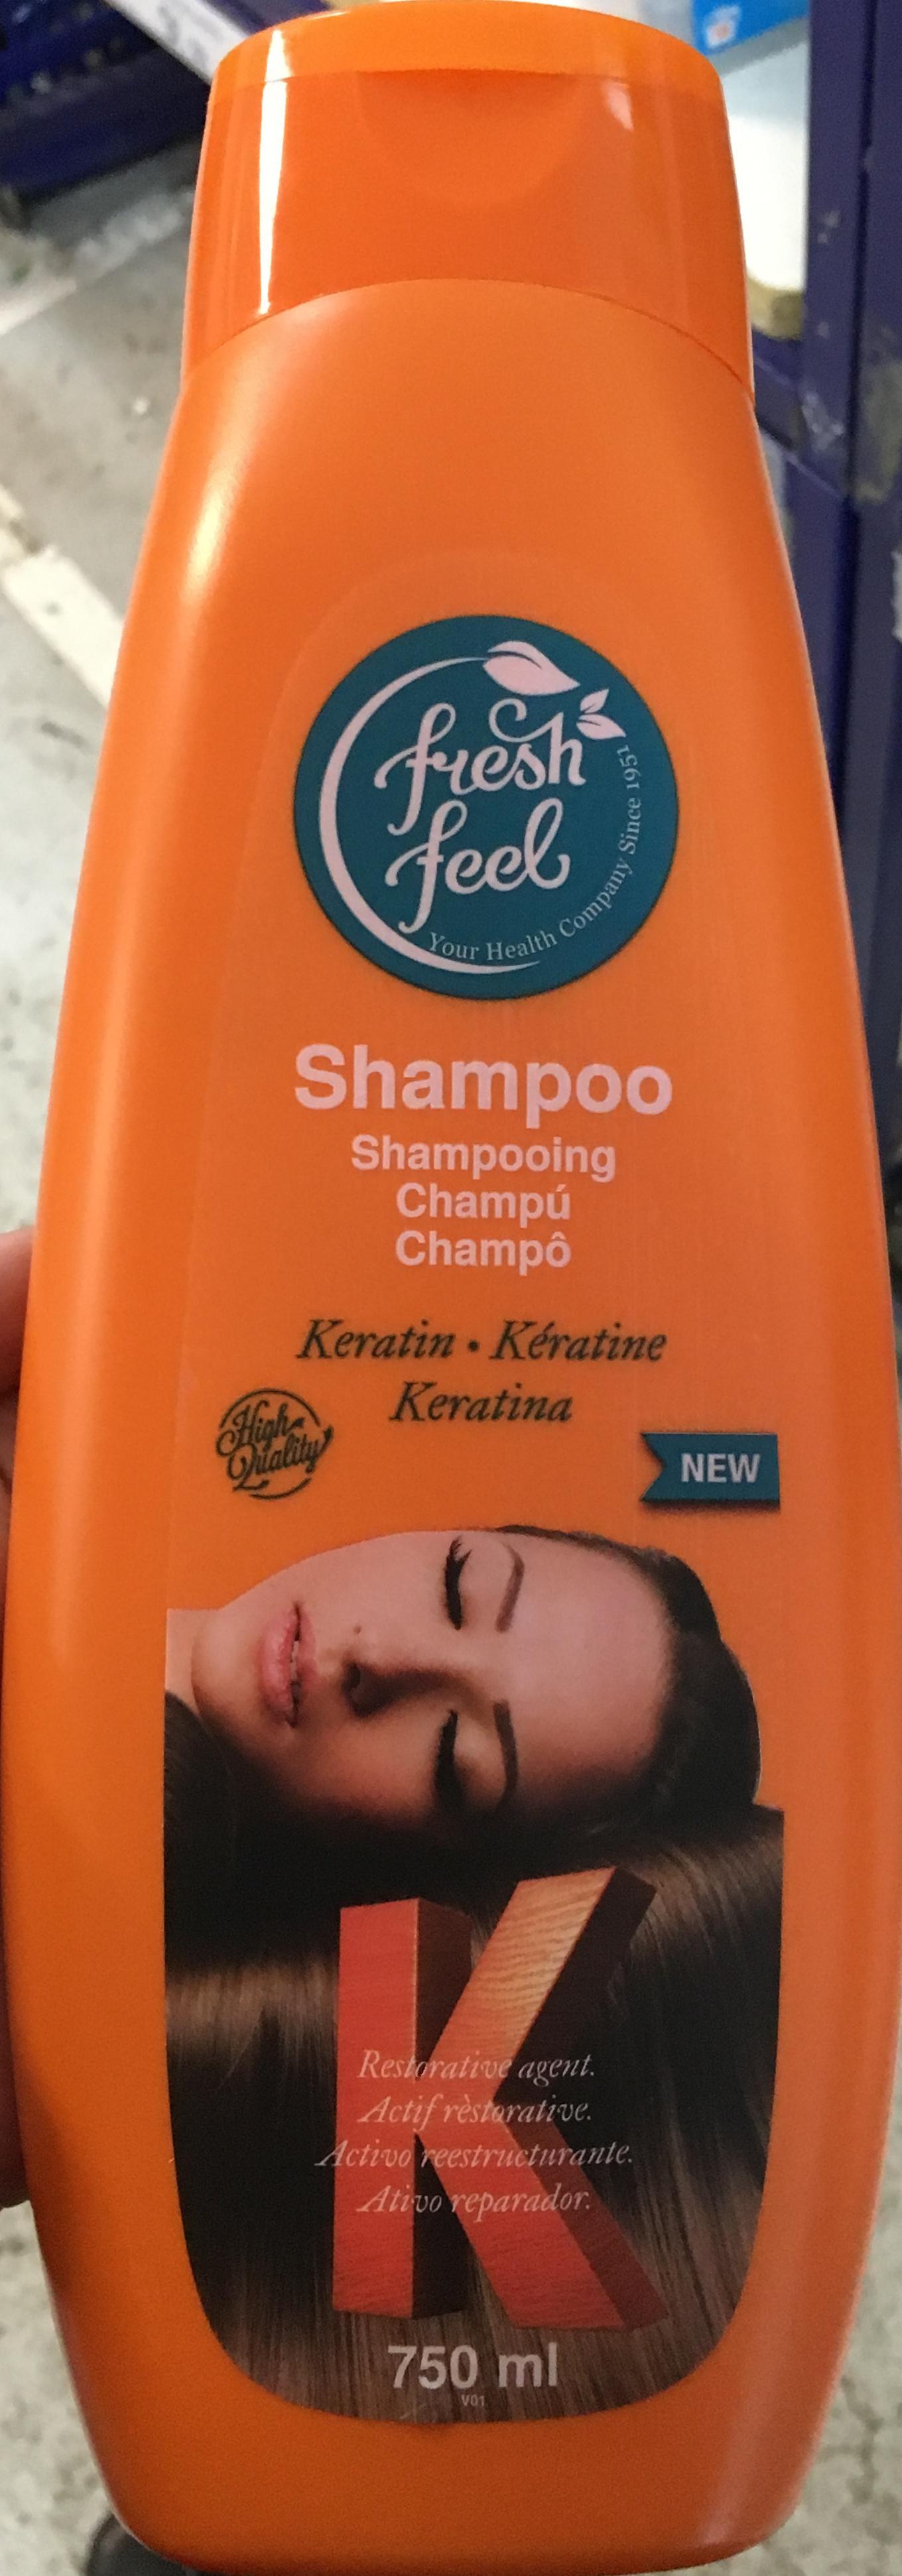 Shampooing Kératine - Product - fr